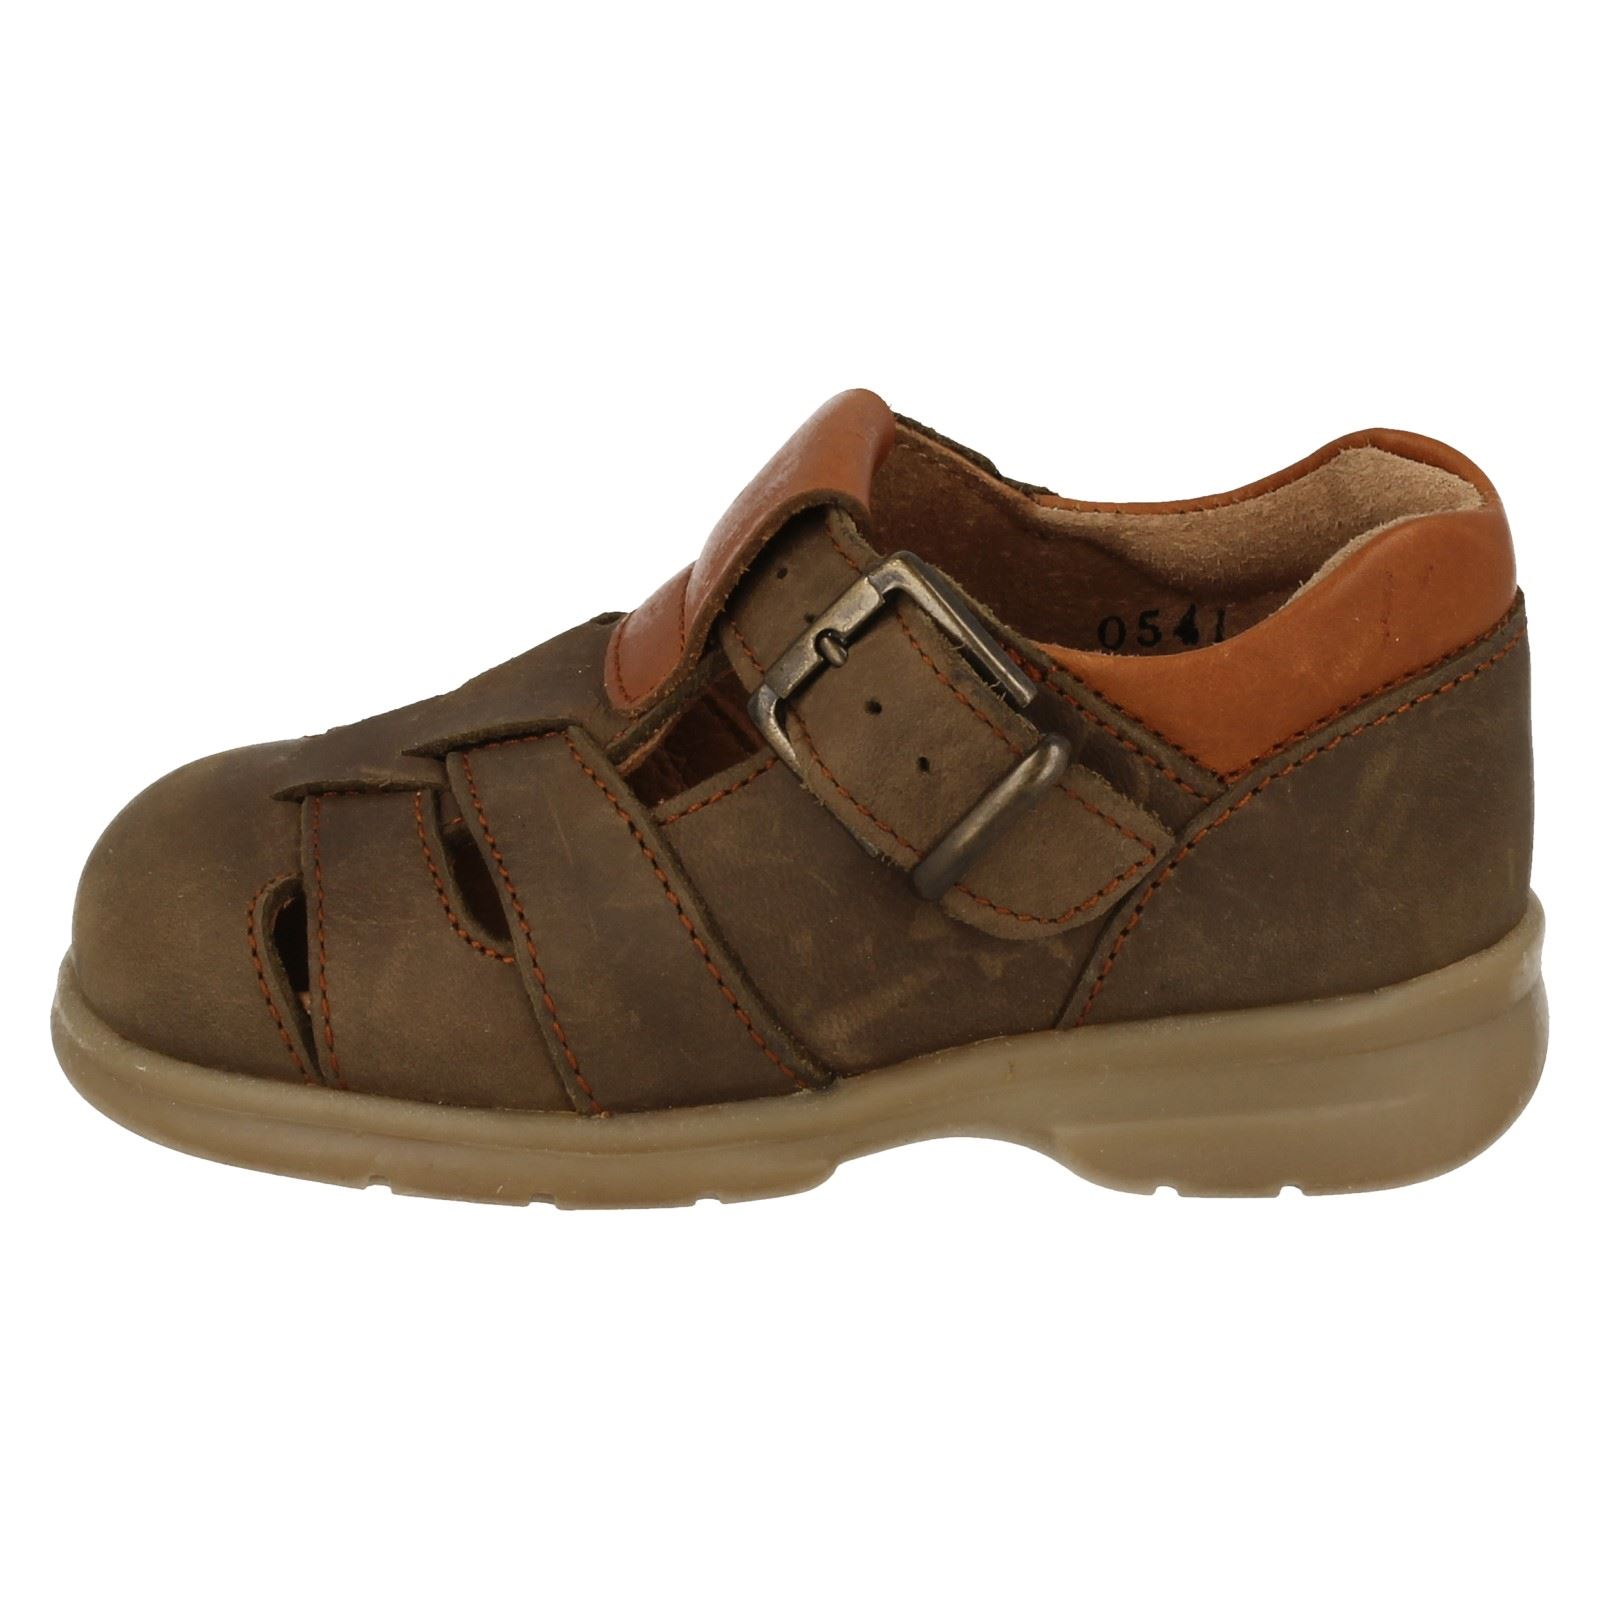 Startrite-Infant-Boys-T-Bar-Summer-Shoes-Fisher